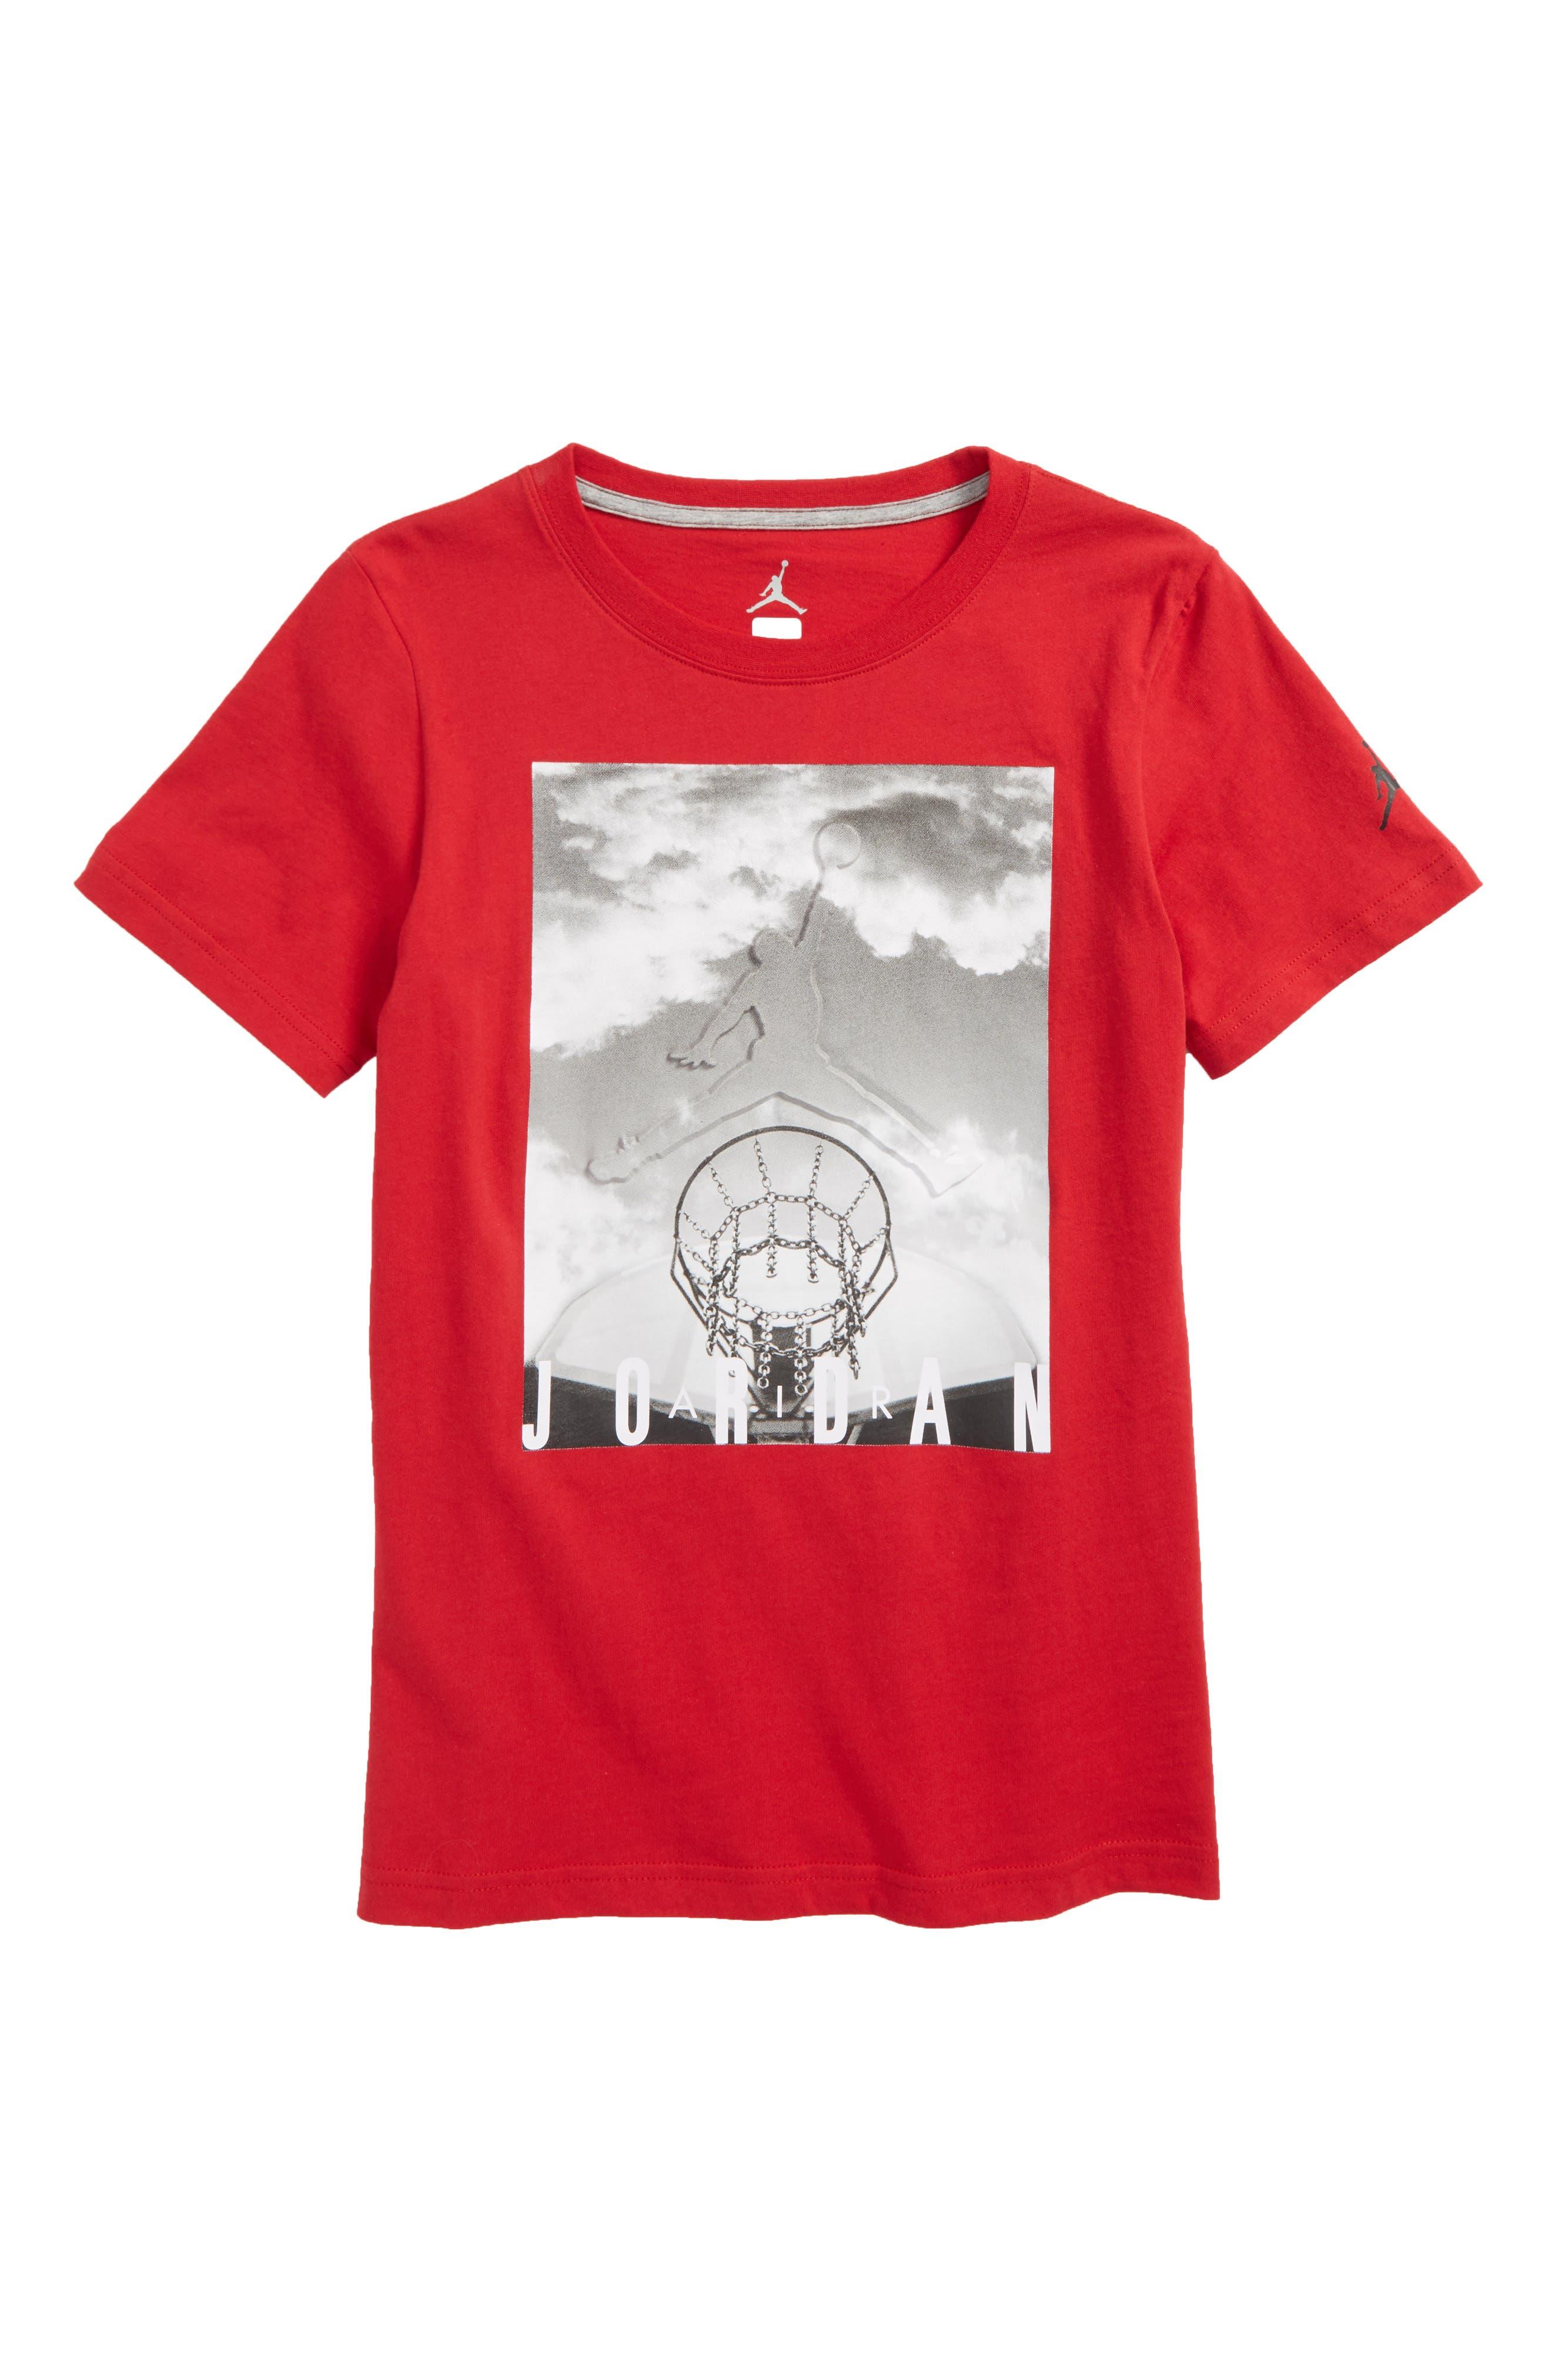 Jordan Hard Court Graphic T-Shirt,                             Main thumbnail 1, color,                             606